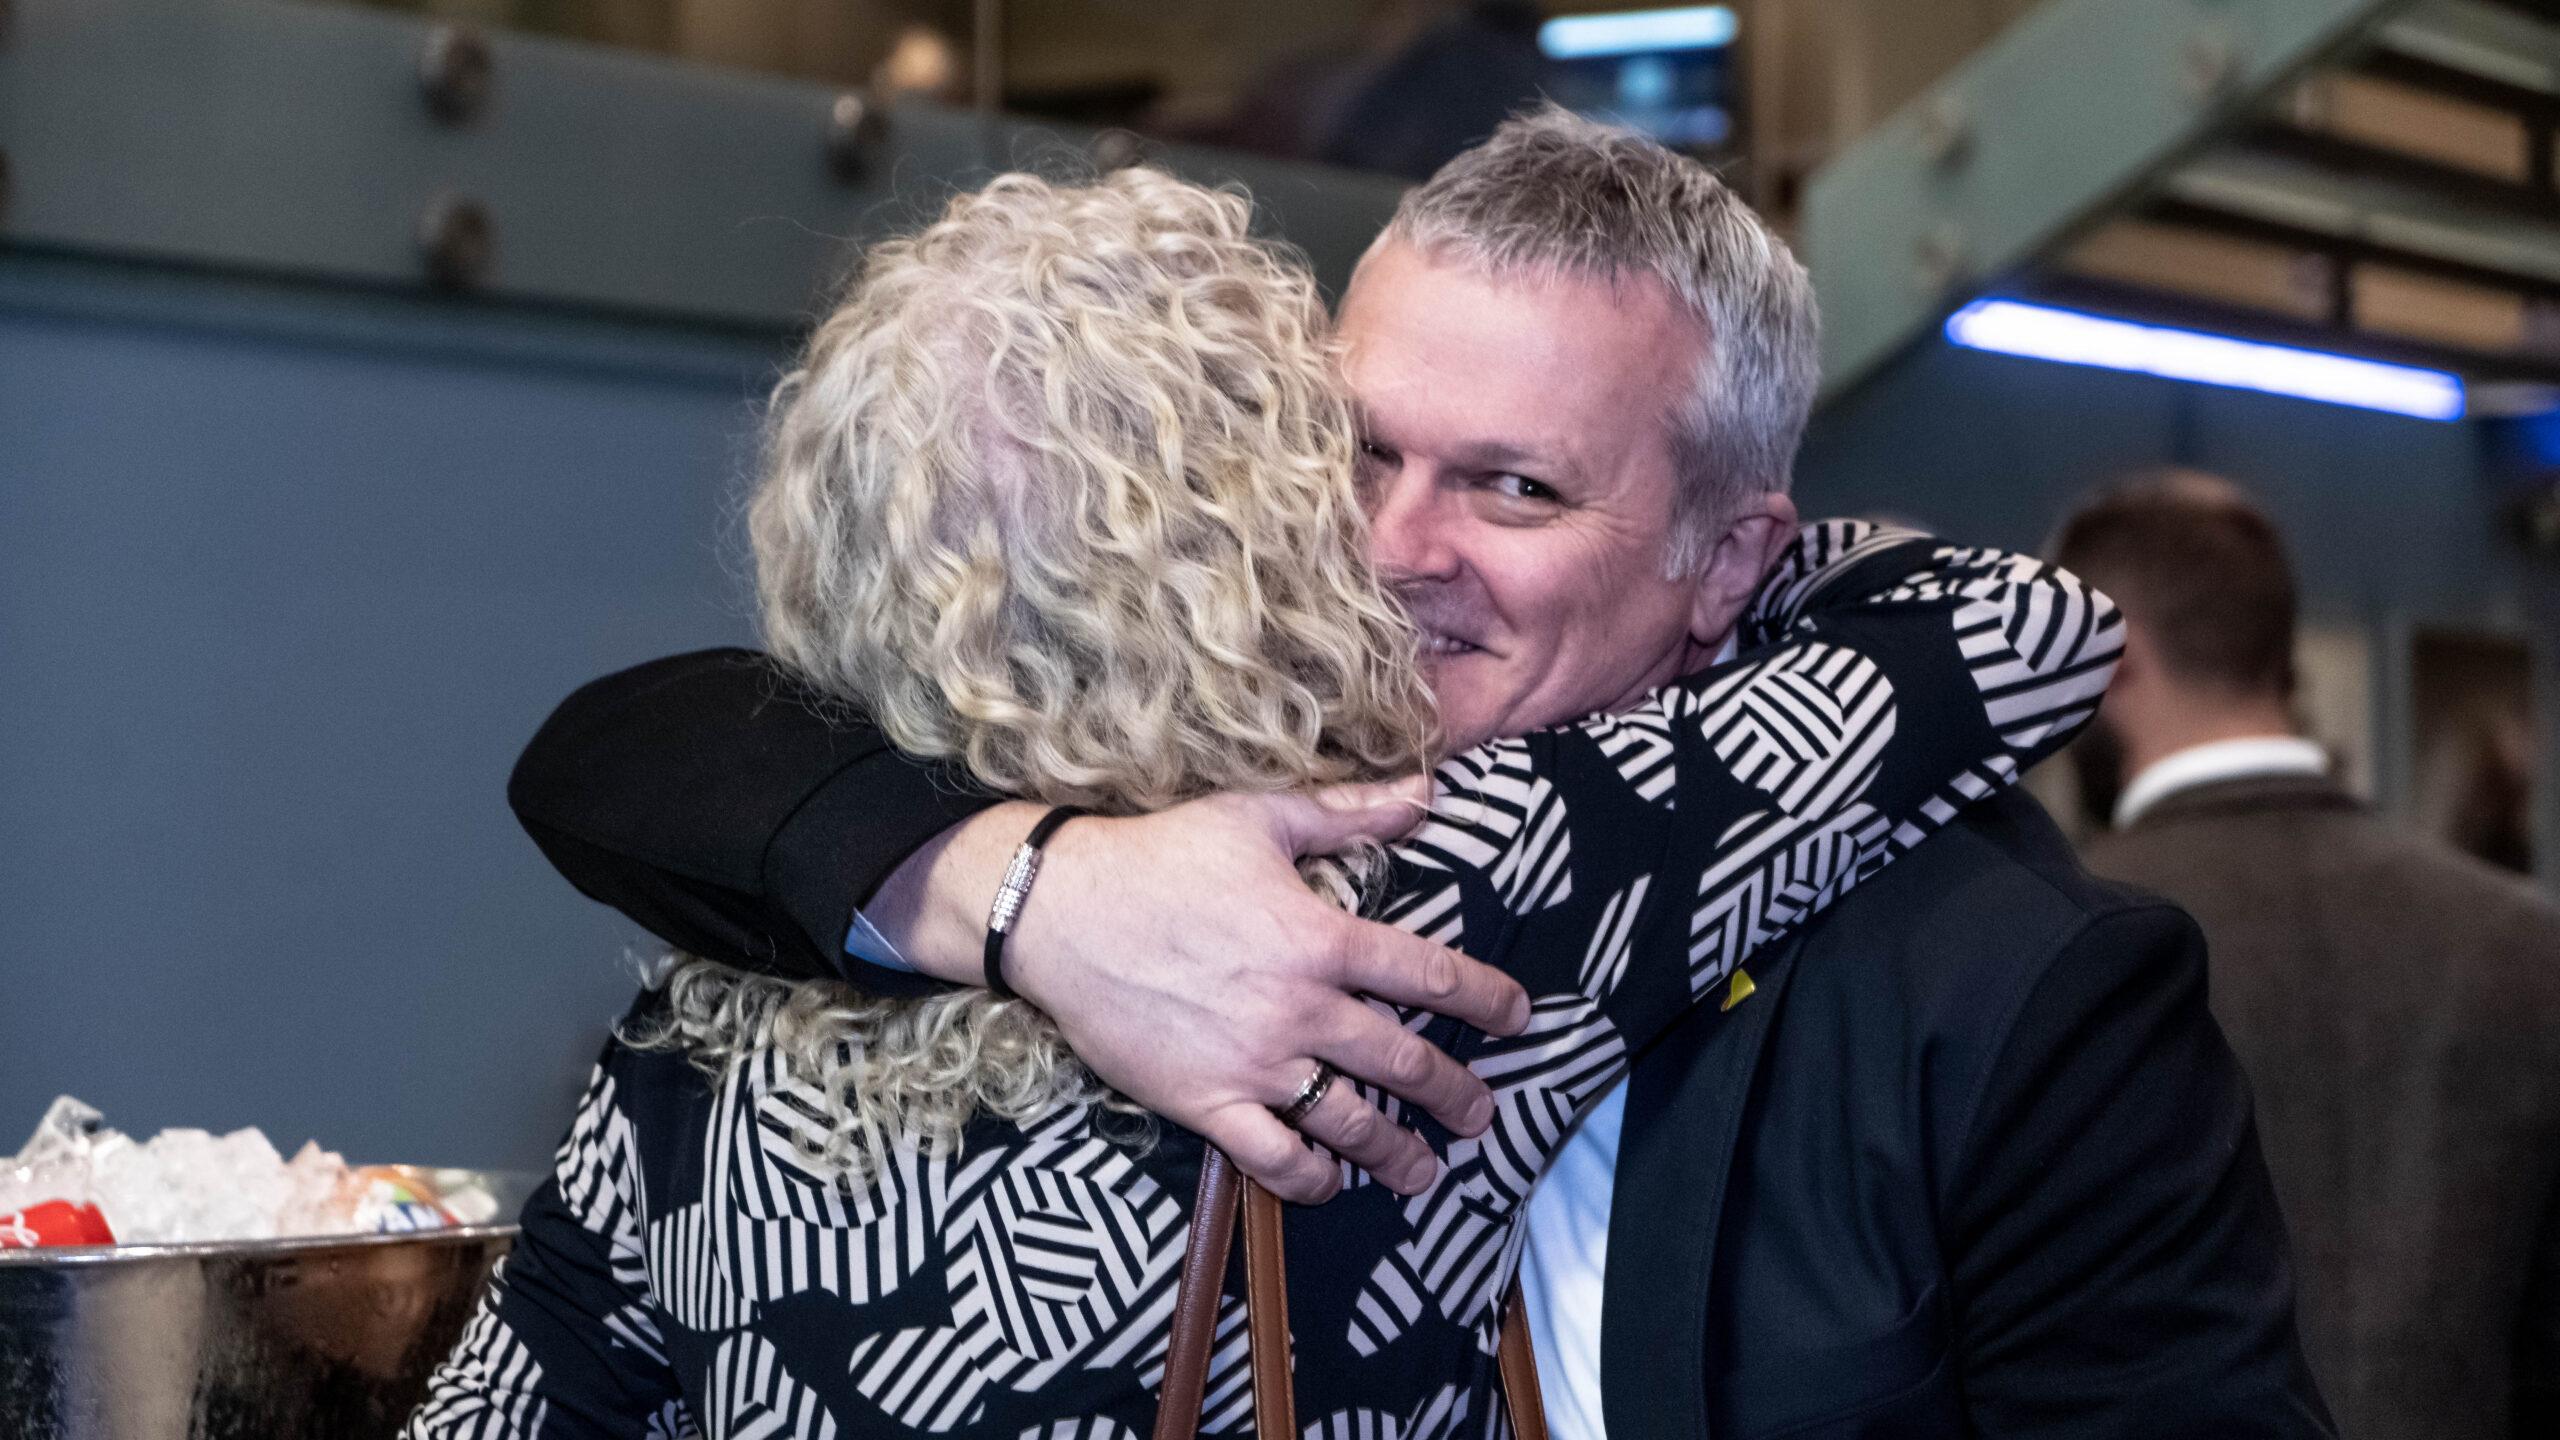 Alistair Hugging a women